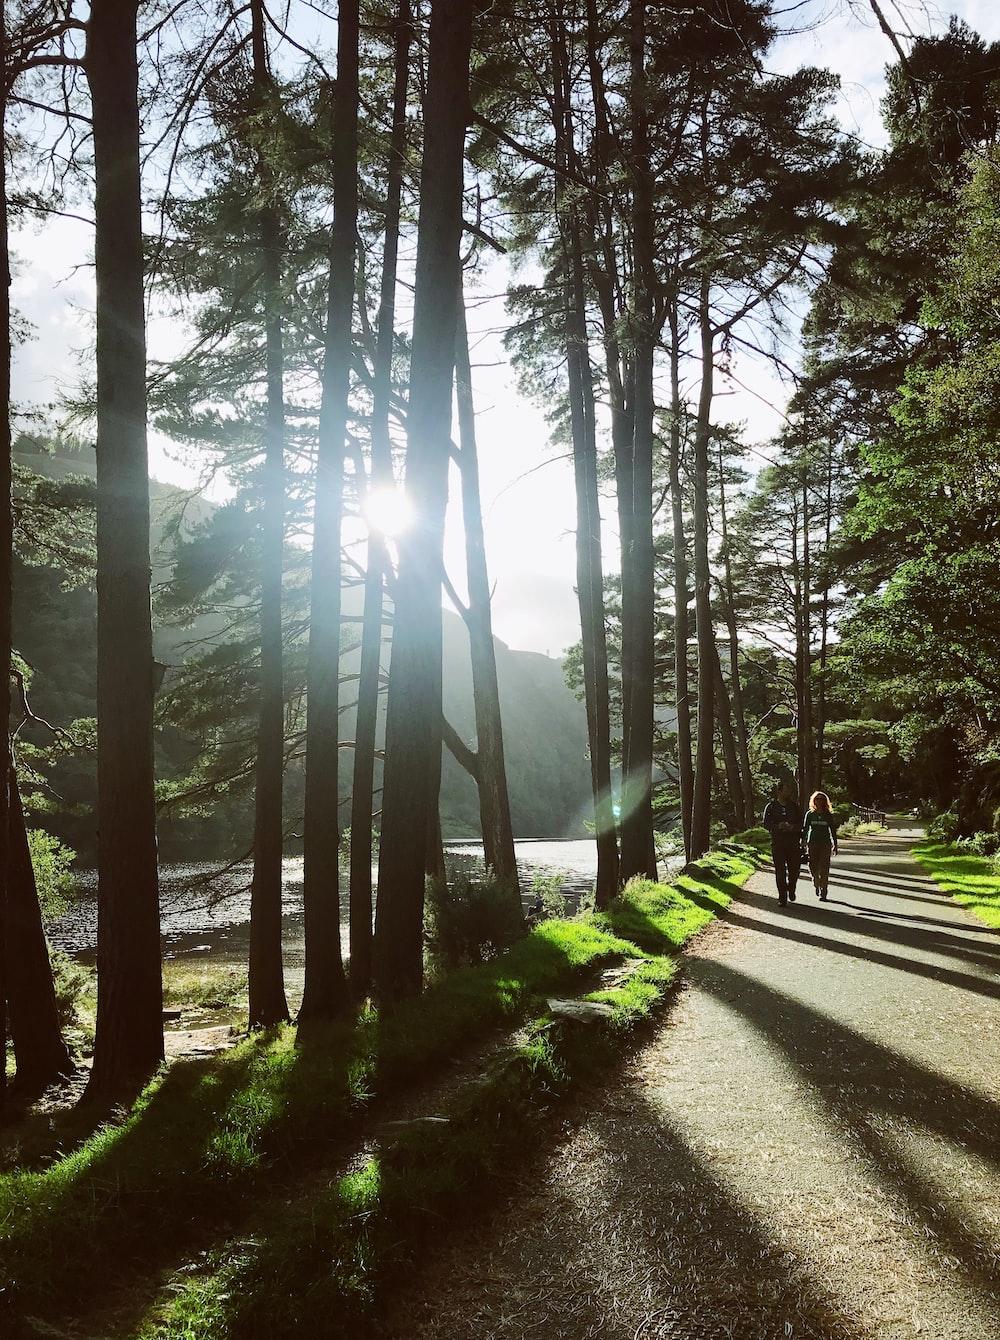 two people walking on pathway near trees